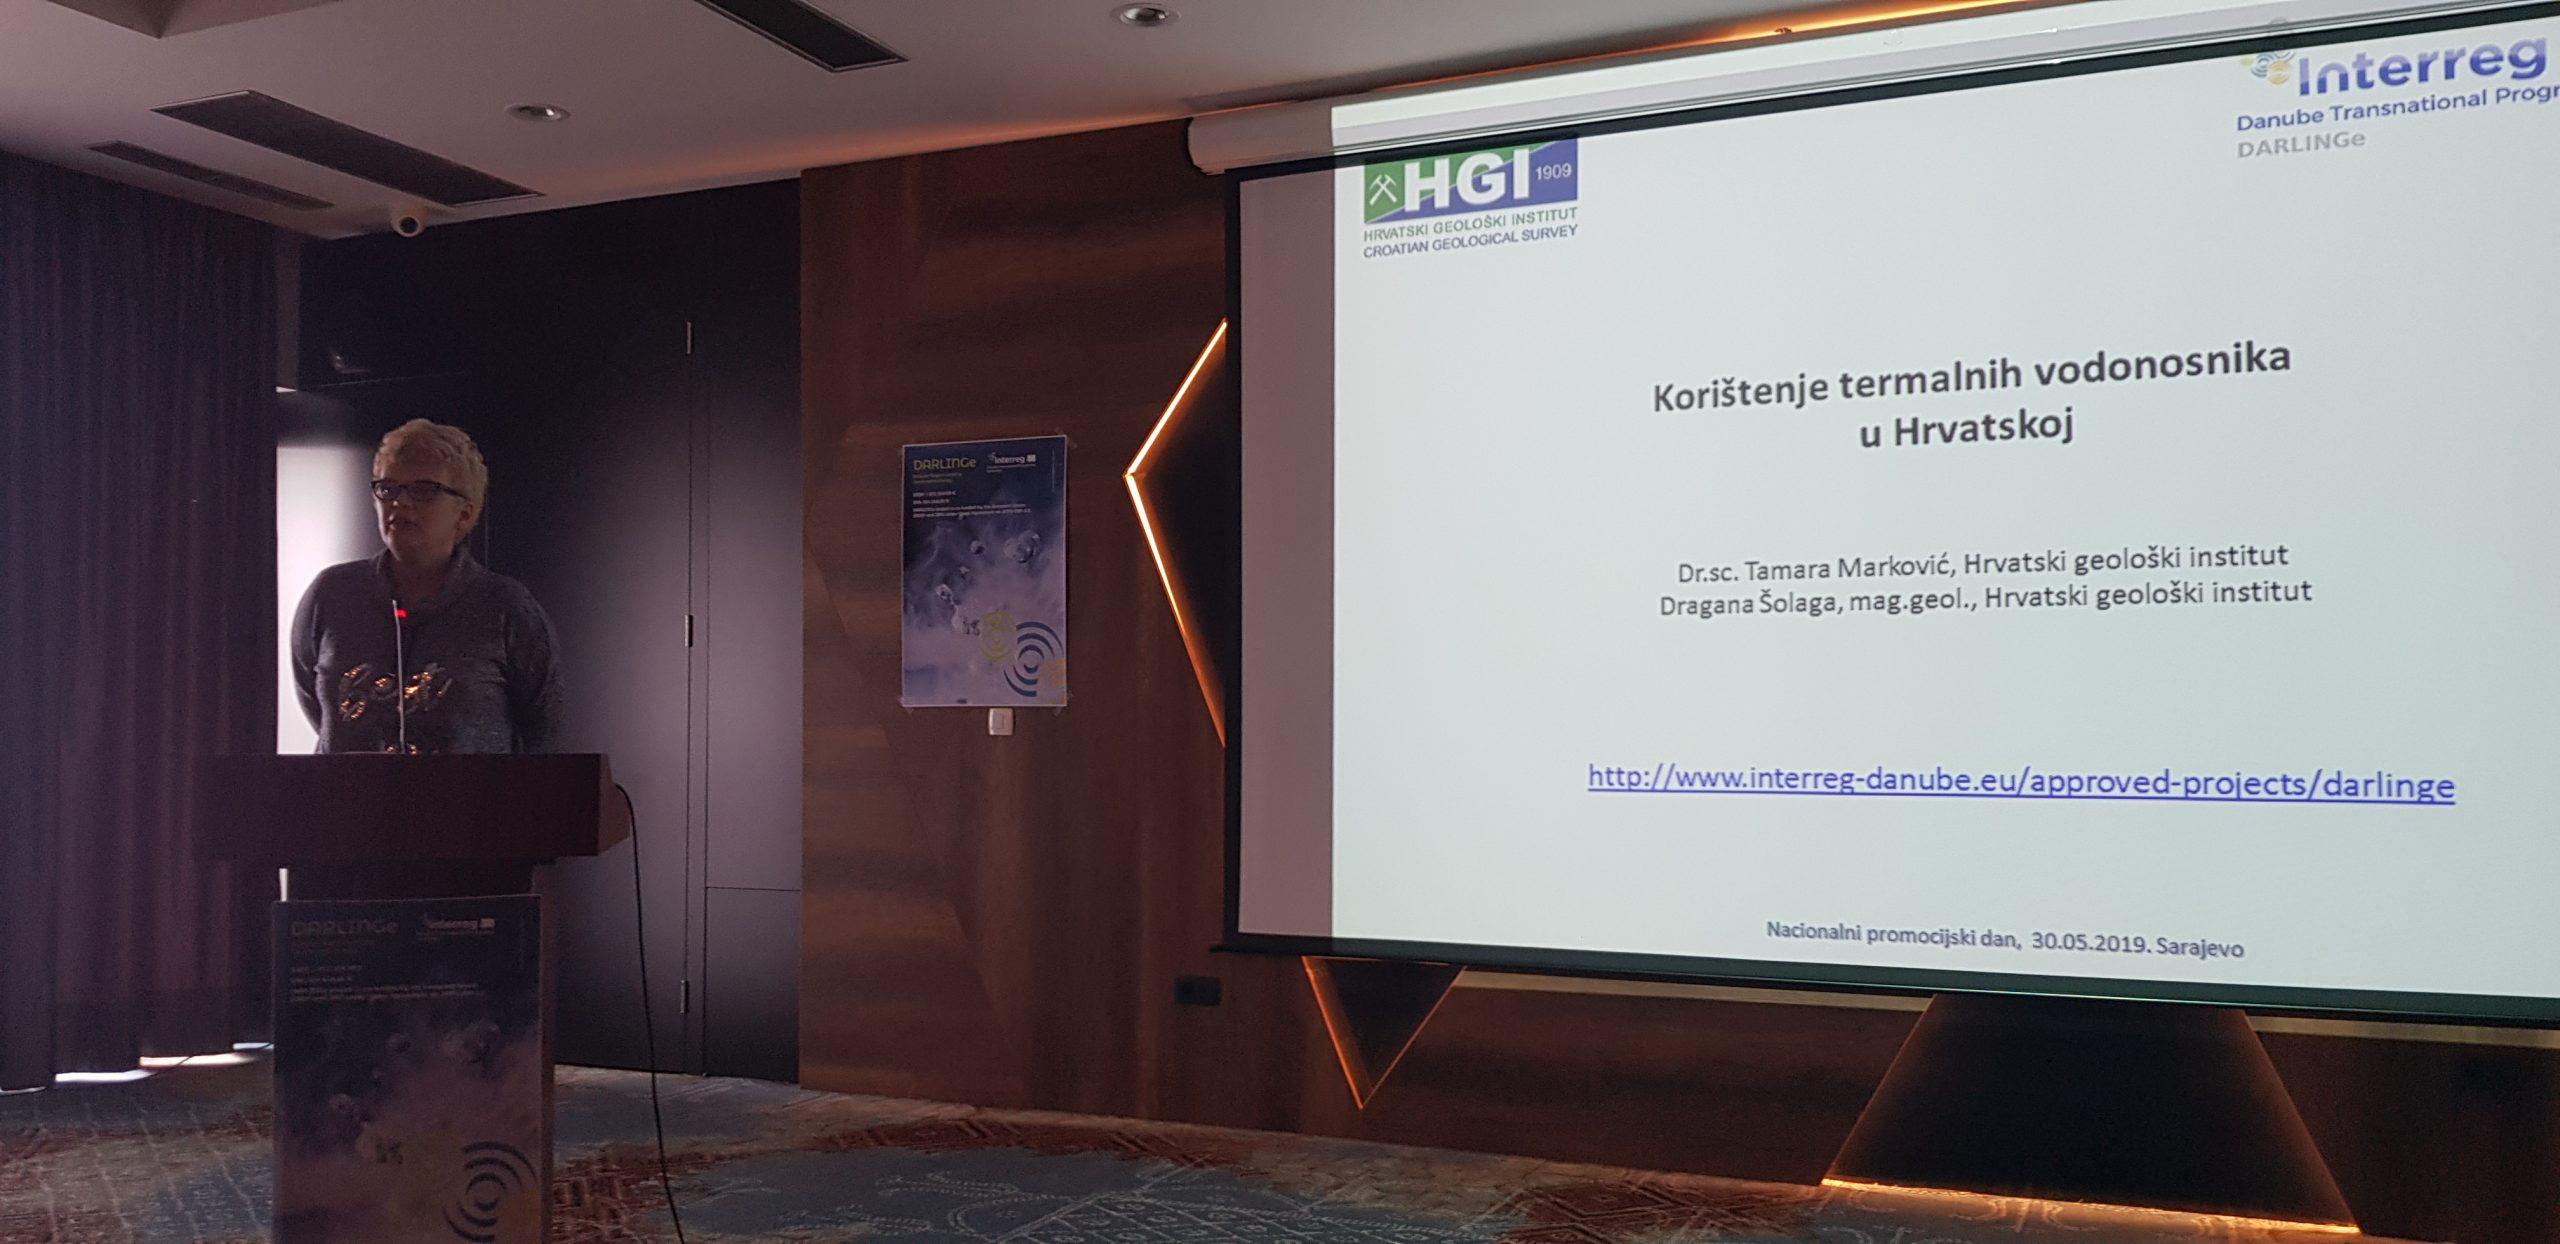 Dr.sc. Tamara Markovic tijekom predavanja